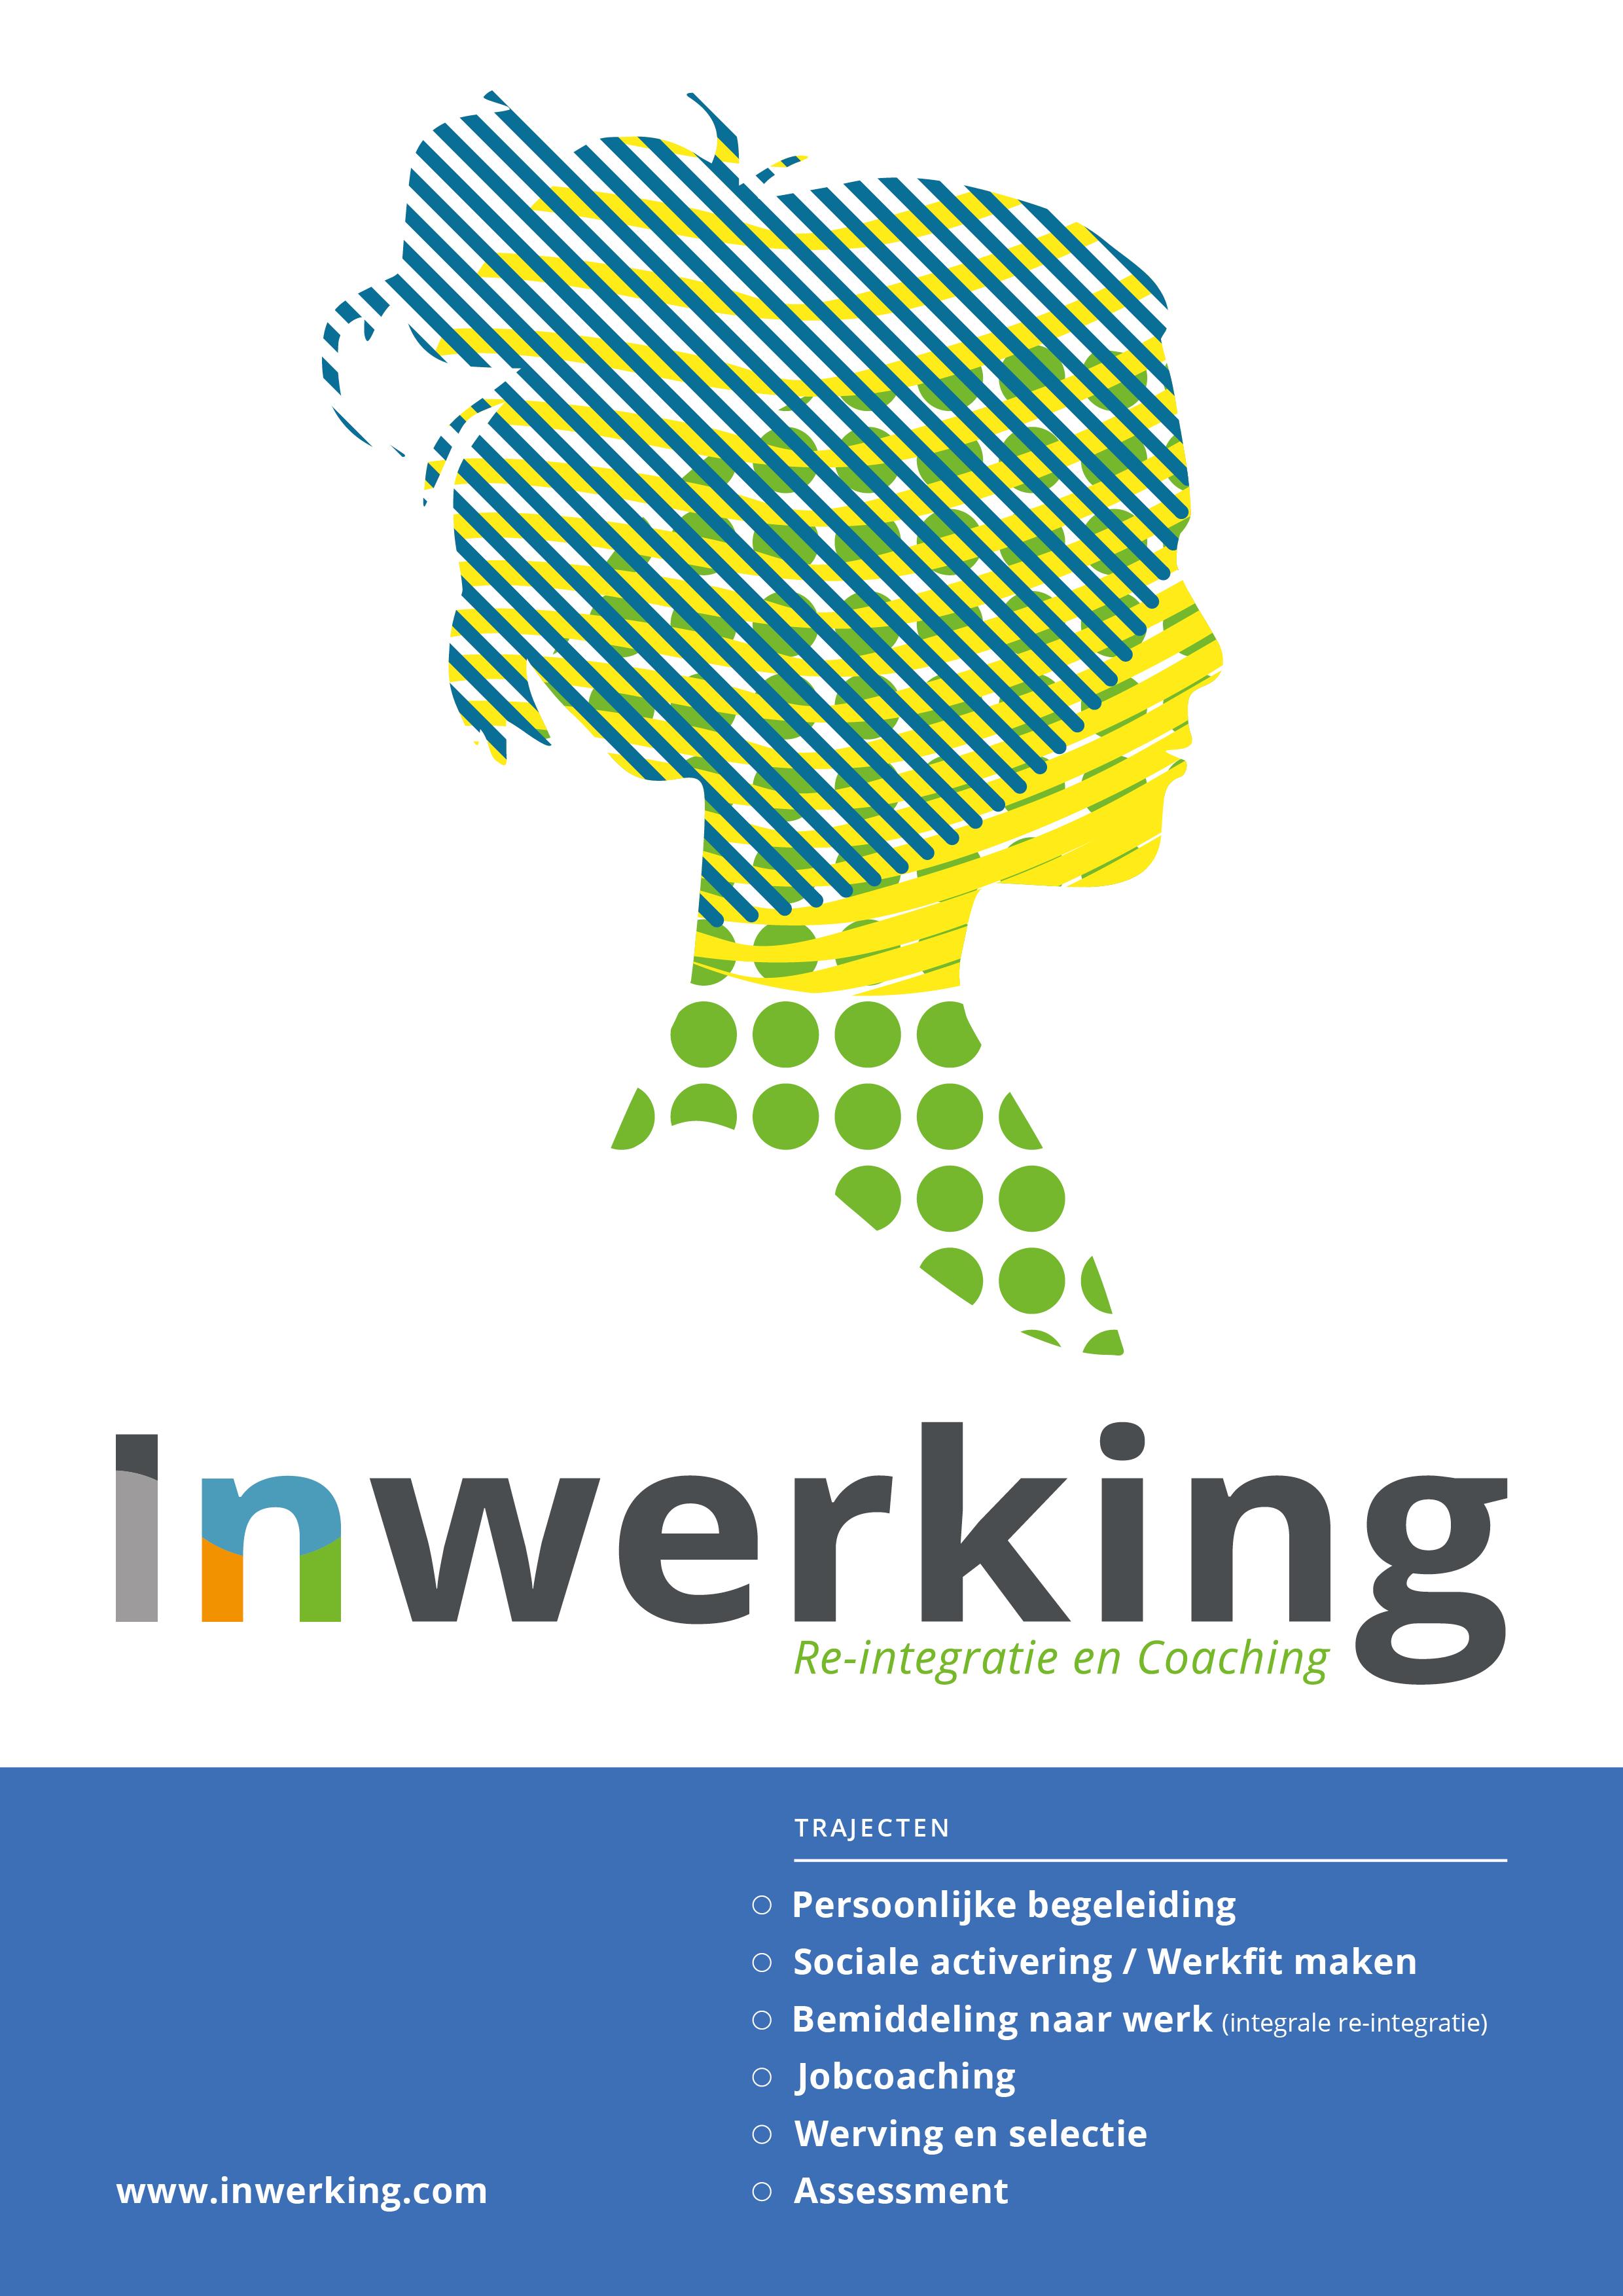 nwerking-2018-A4-Brochure-TRAJECTEN